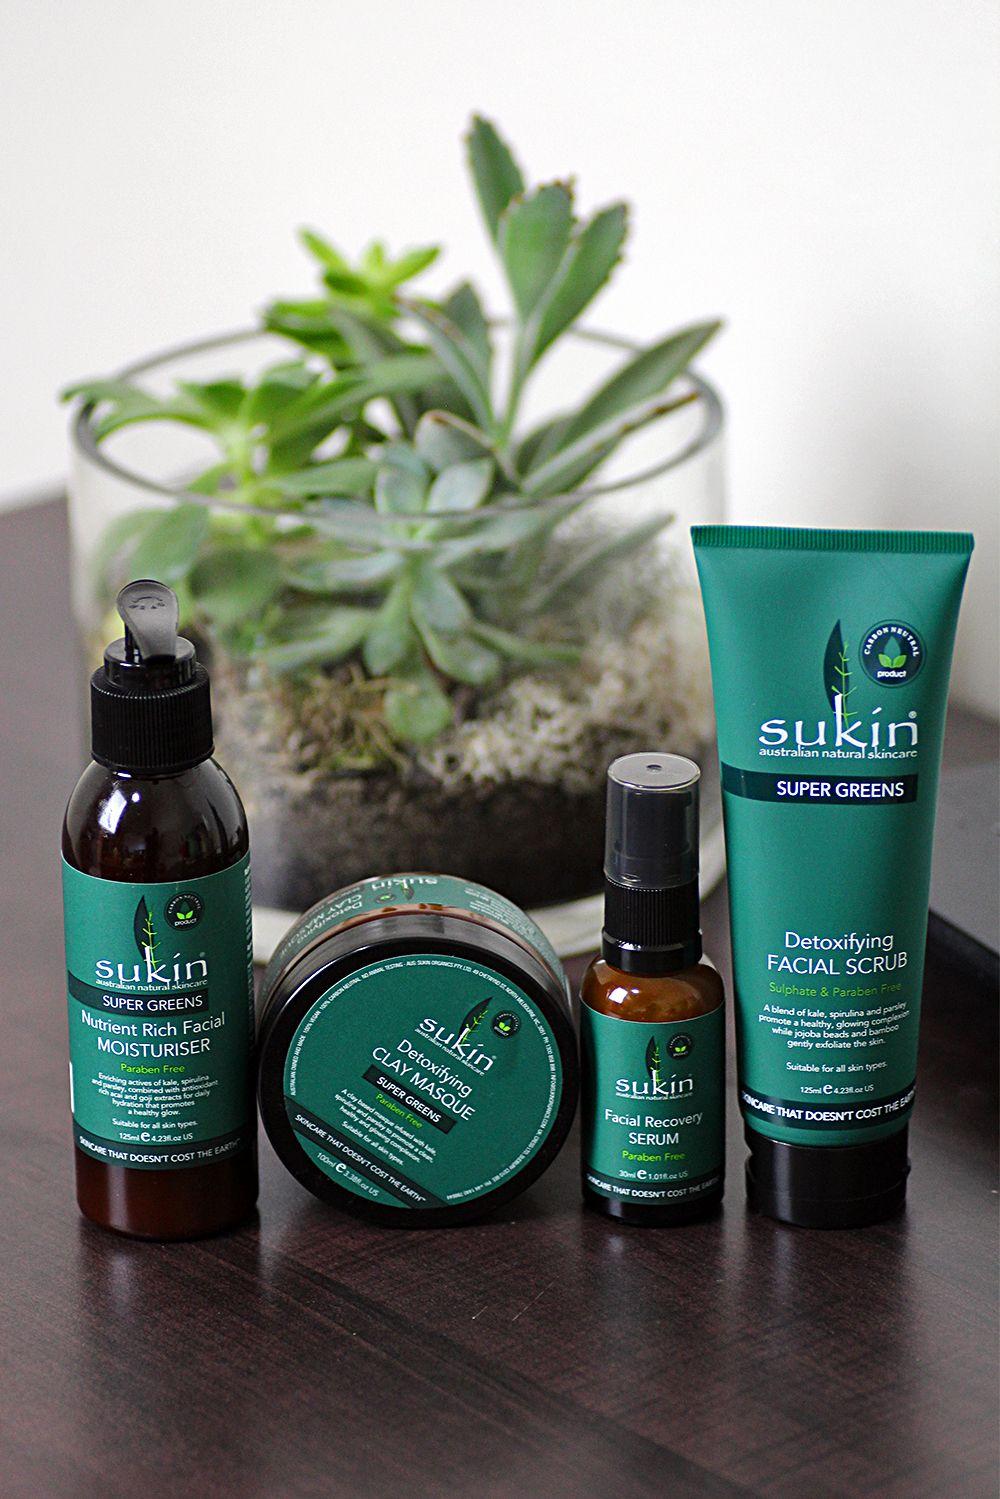 Sukin Super Greens Win The Complete Range Sukin Skincare Skin Care Cruelty Free Skin Care